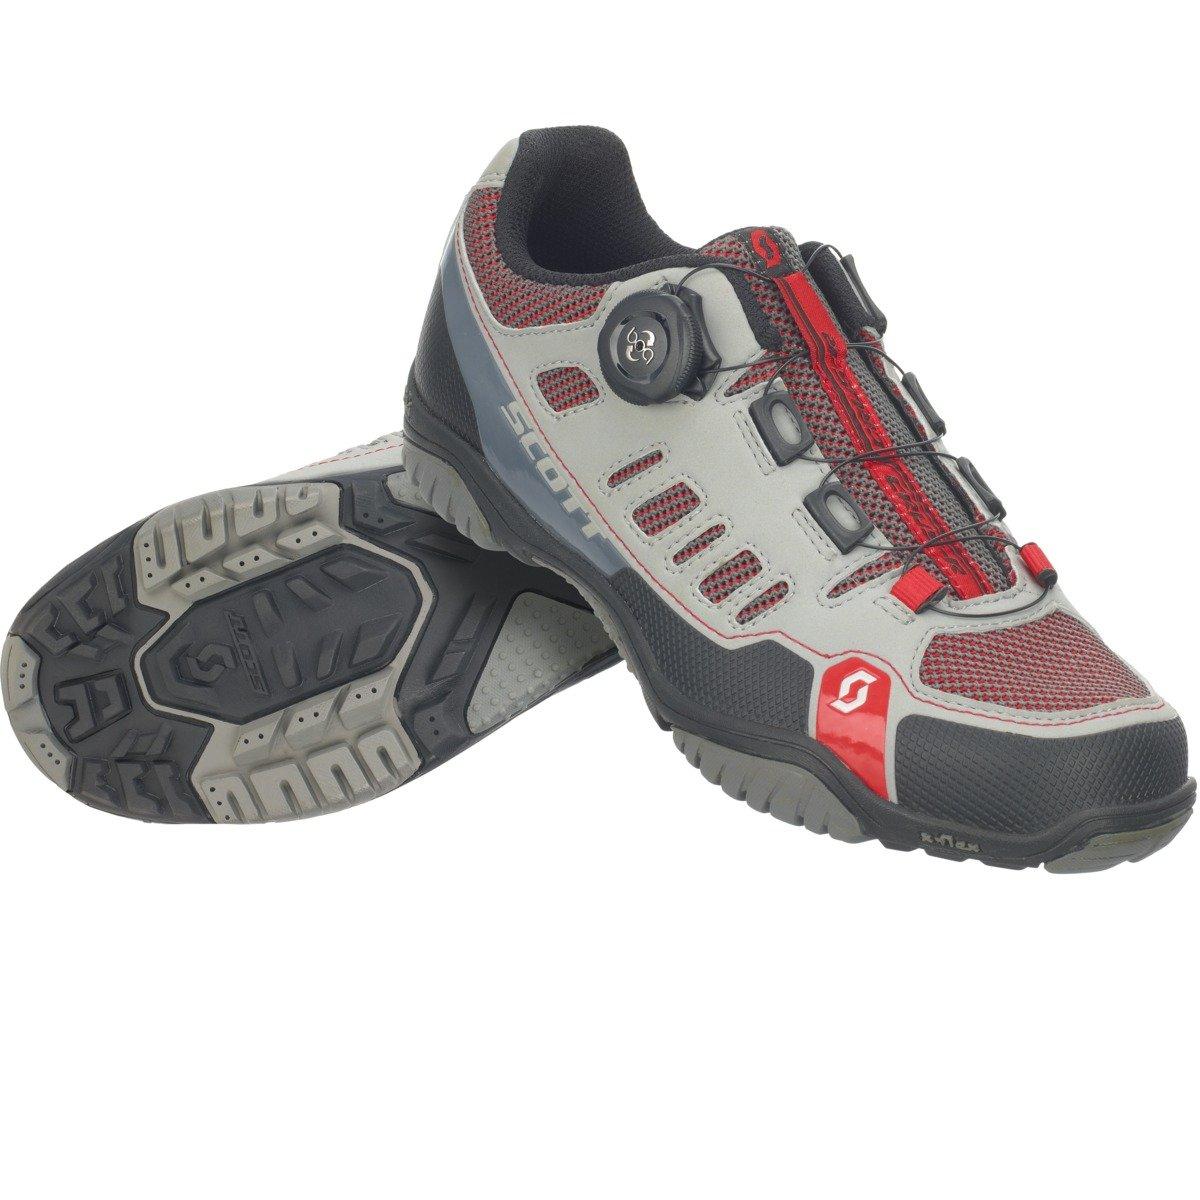 Scott Damen Damen Damen Sport Crus-r Boa Mountainbike Schuhe f49bca